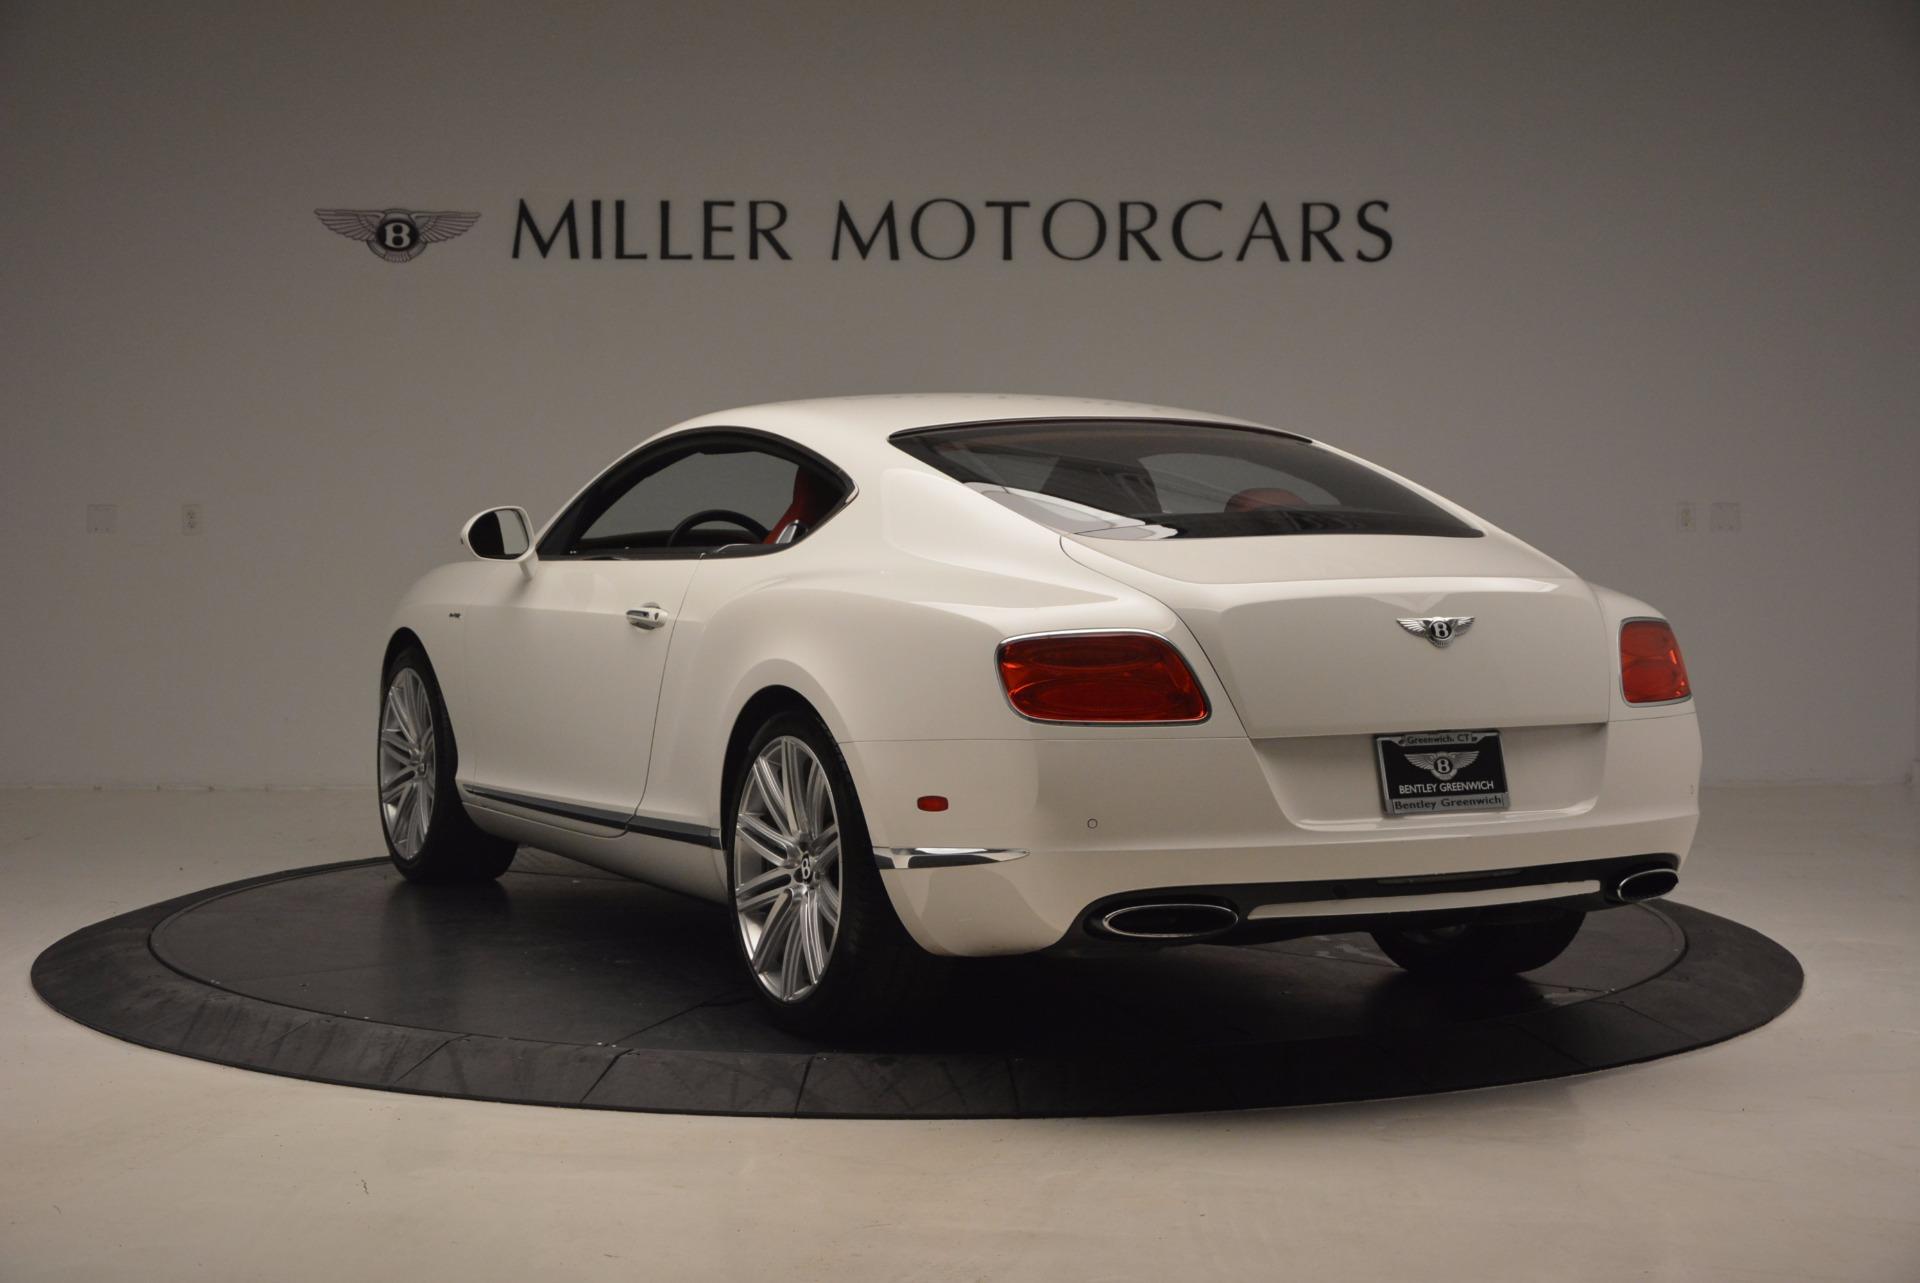 Used 2014 Bentley Continental GT Speed For Sale In Westport, CT 1102_p6